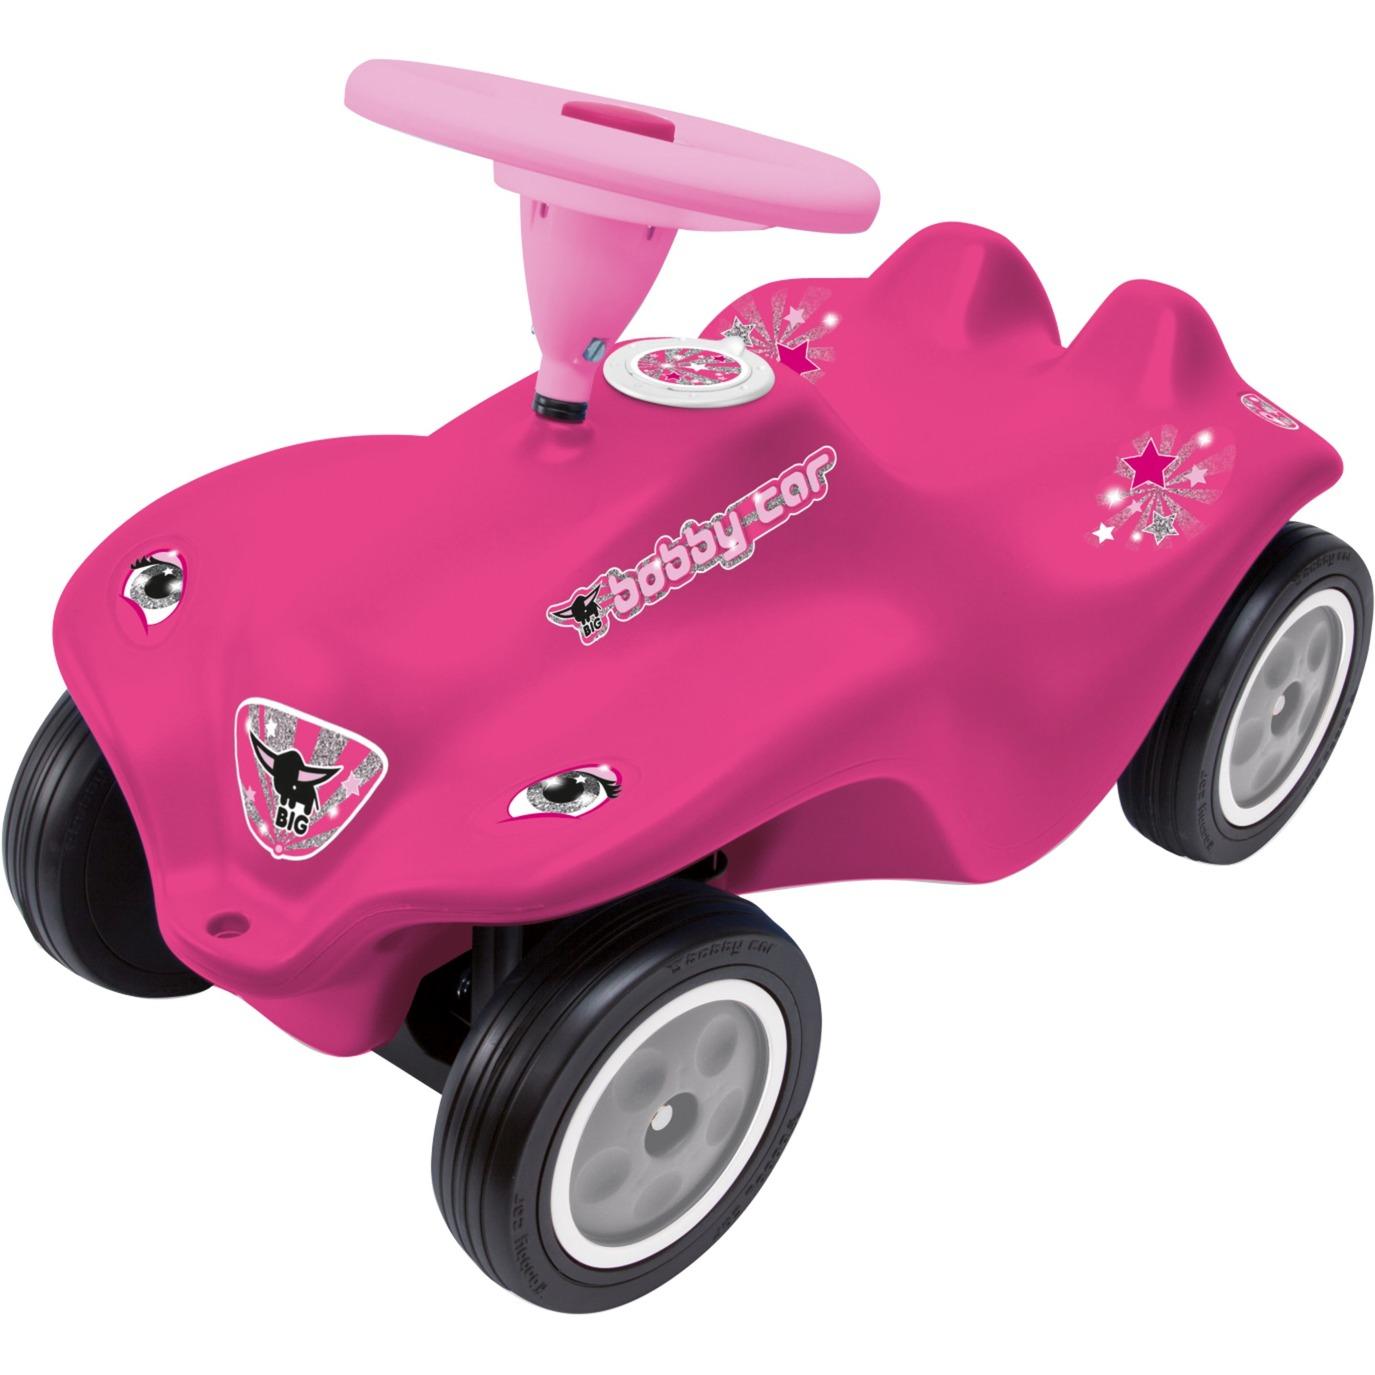 New Bobby Car Rockstar Girl, Toboggan